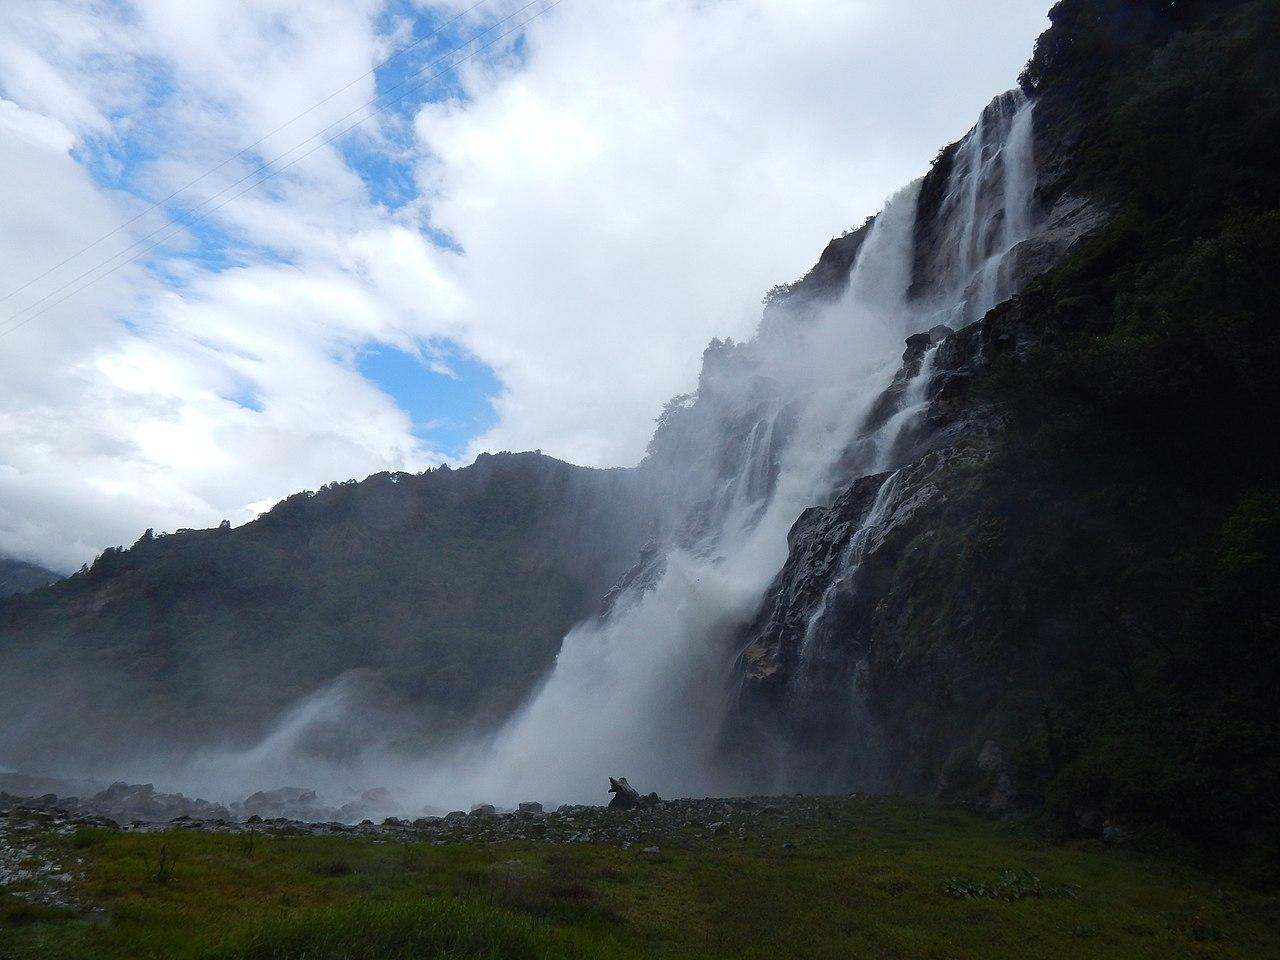 Place Near by Gorichen Peak-Nuranang Falls (Jung Falls), Tawang, Arunachal Pradesh